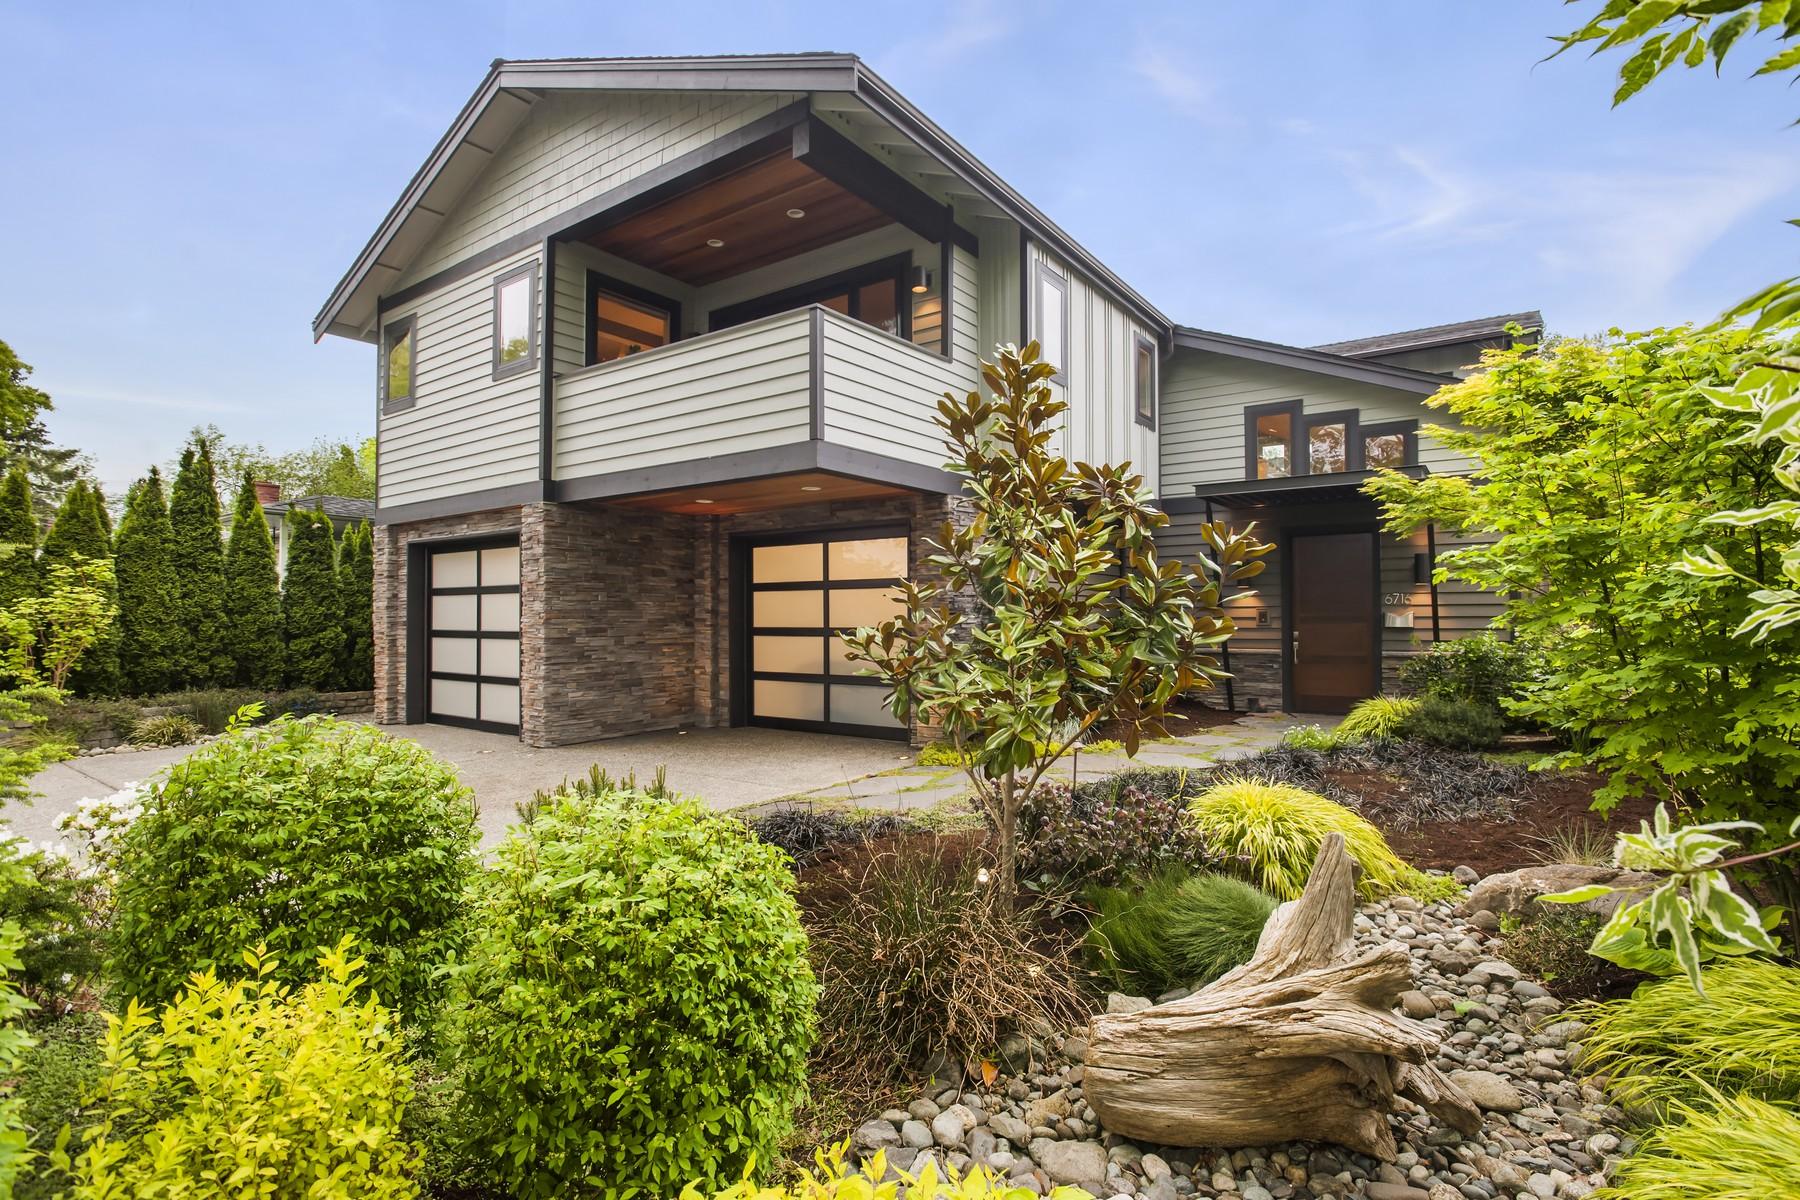 Single Family Home for Sale at Modern Houghton Home 6716 103rd Ave NE Kirkland, Washington, 98033 United States